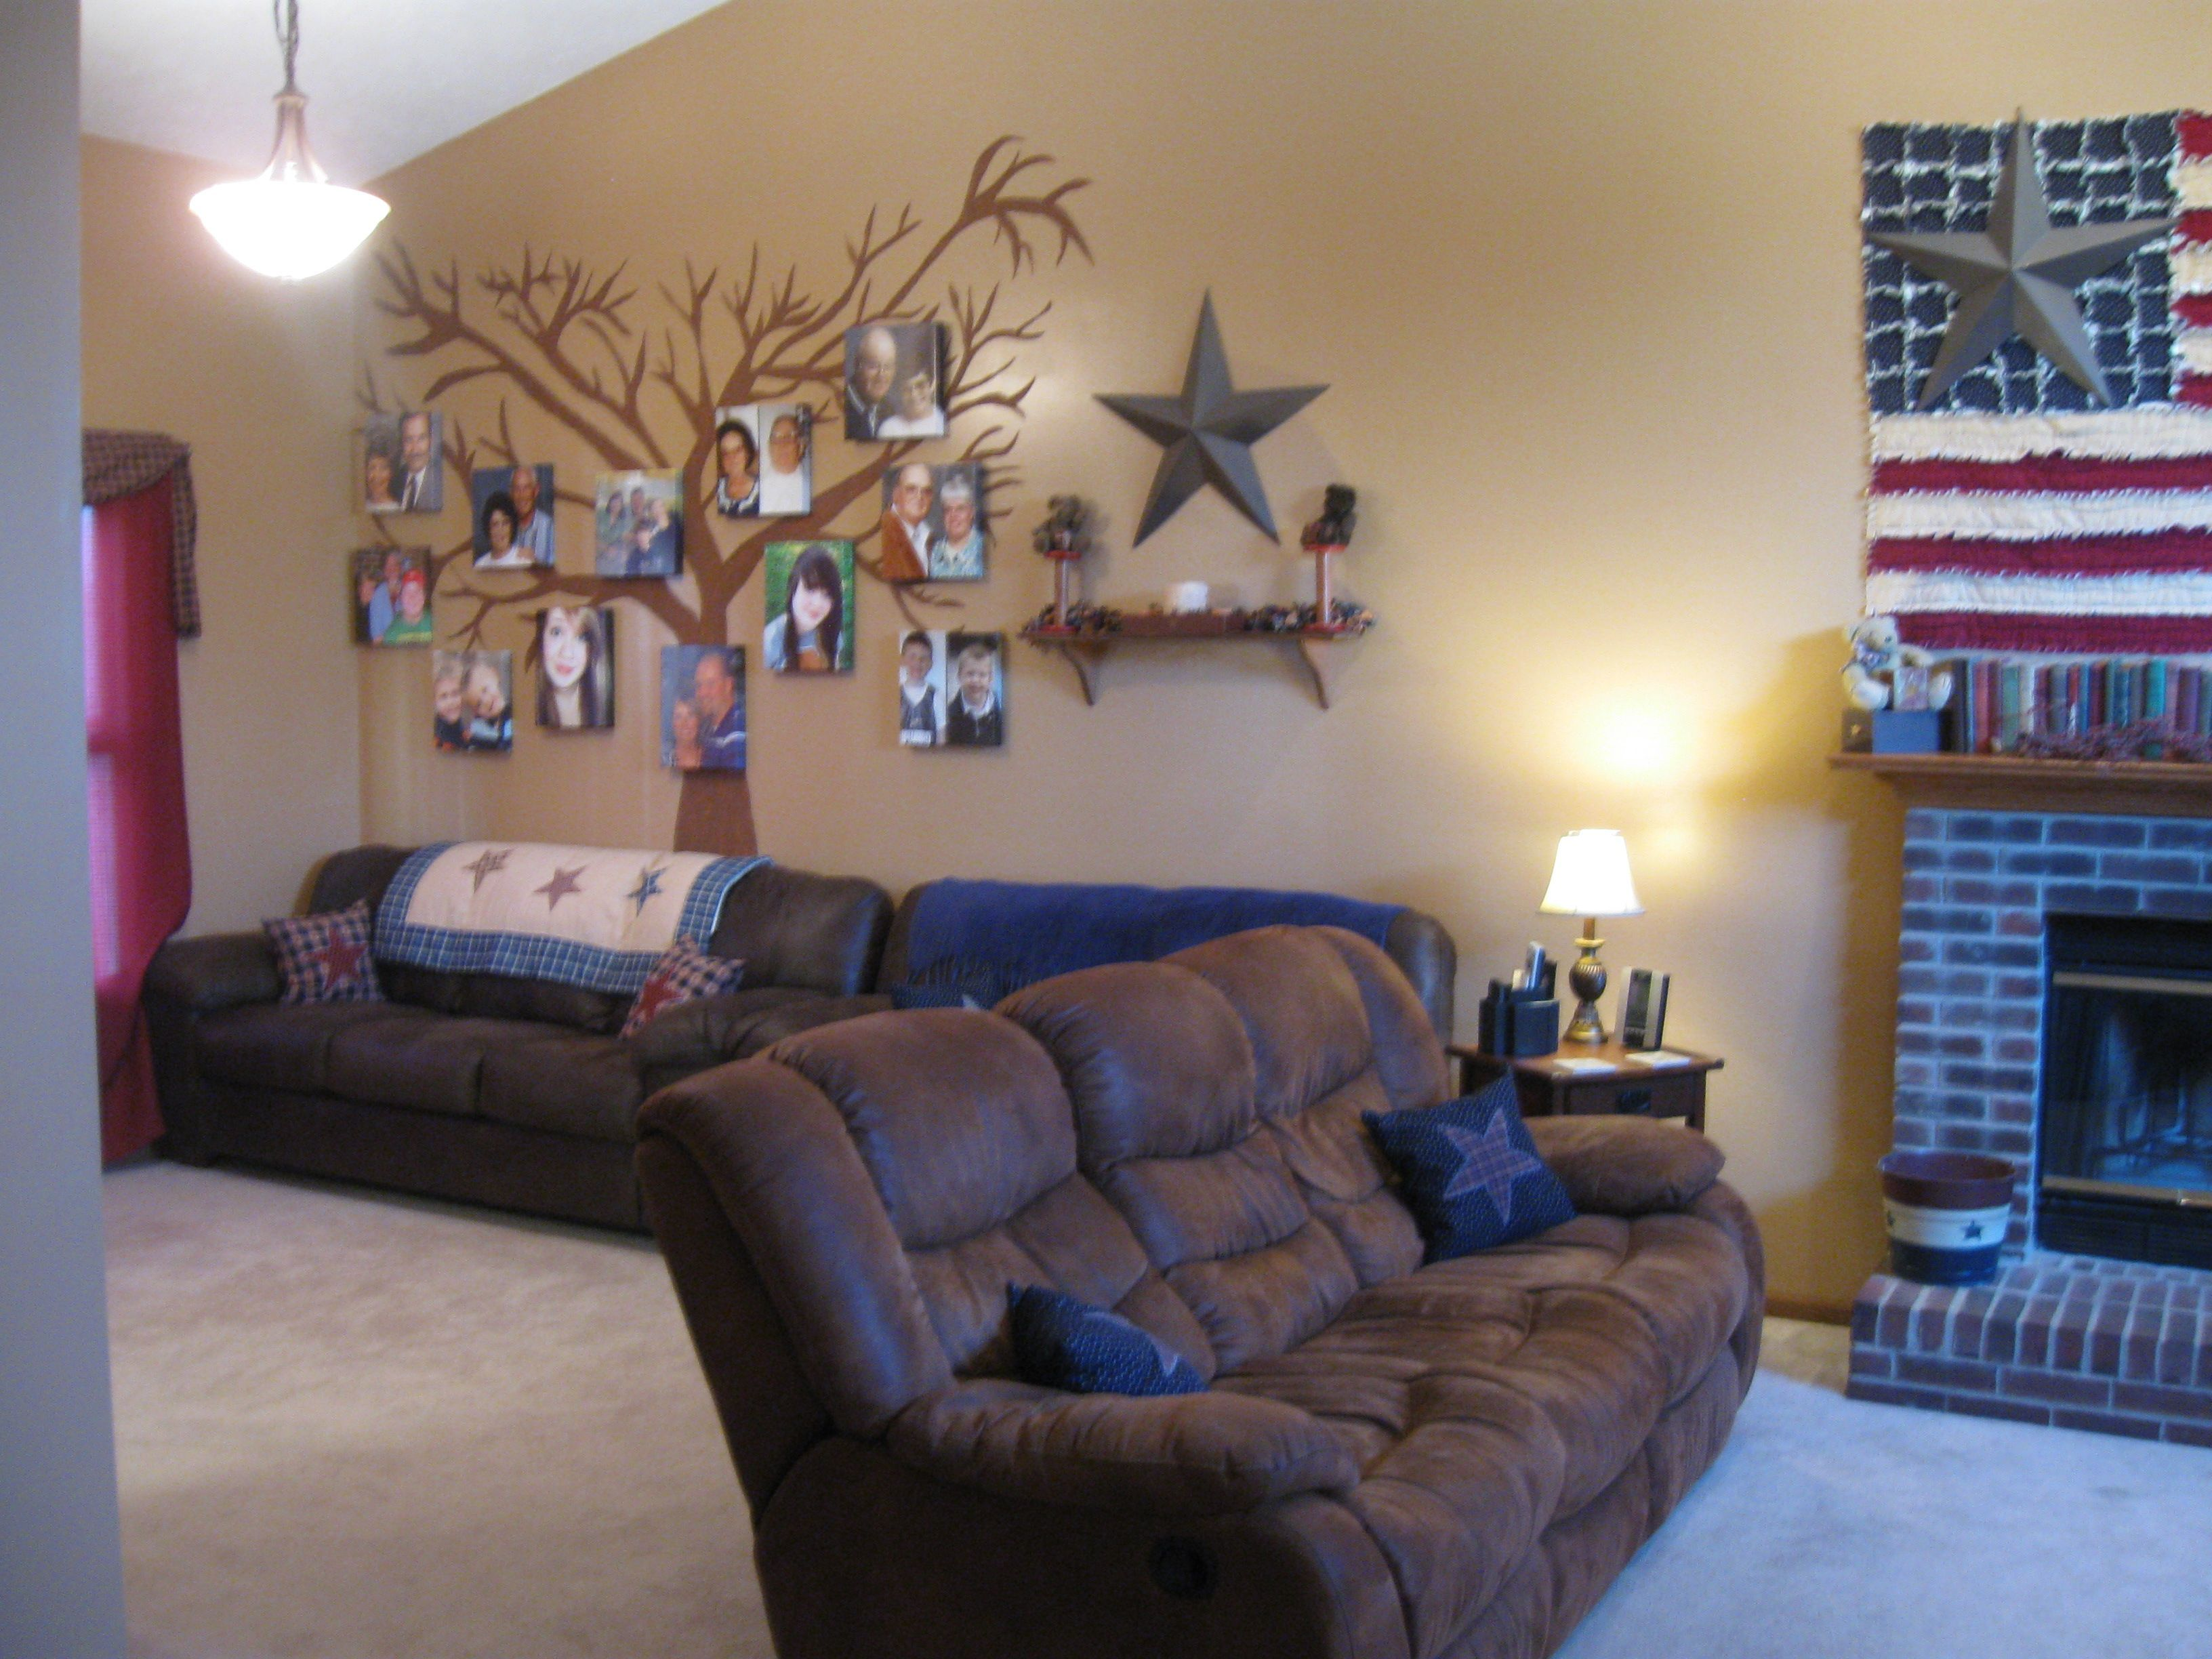 Americana Living Room Decorating Ideas Living Room Decor Country Country Living Room Country Living Room Furniture